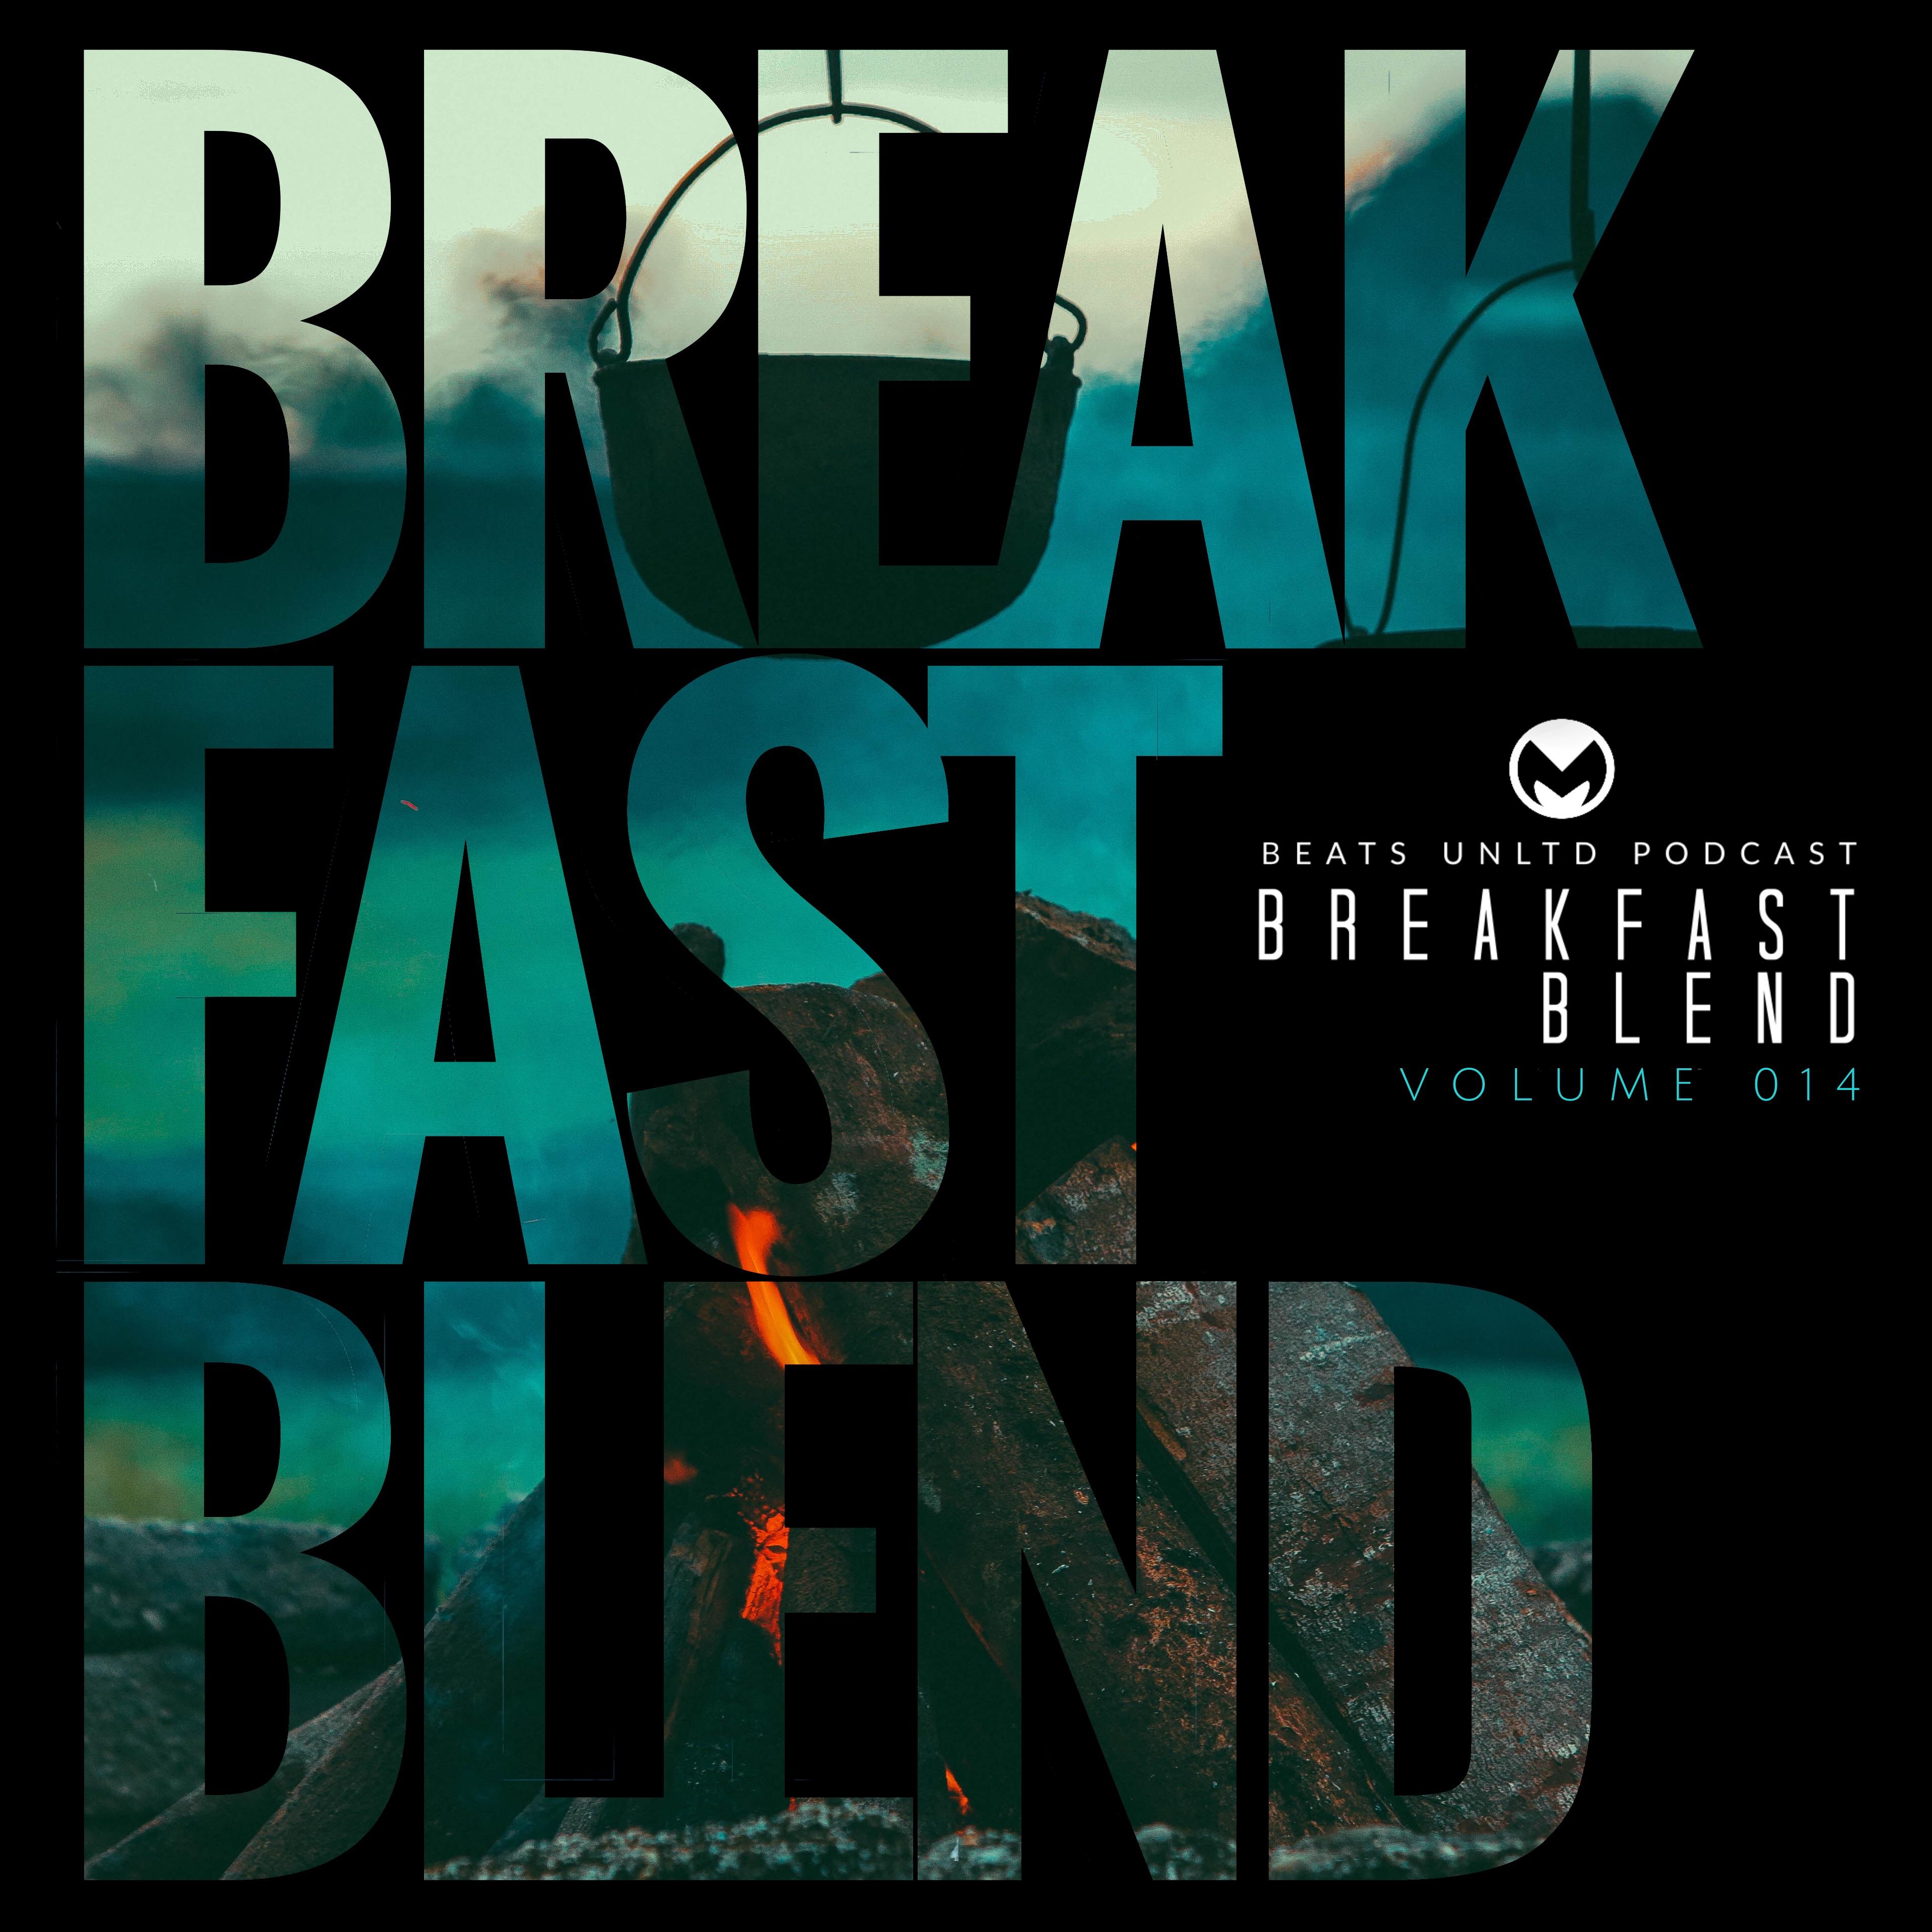 239 Breakfast Blend Volume Forteen